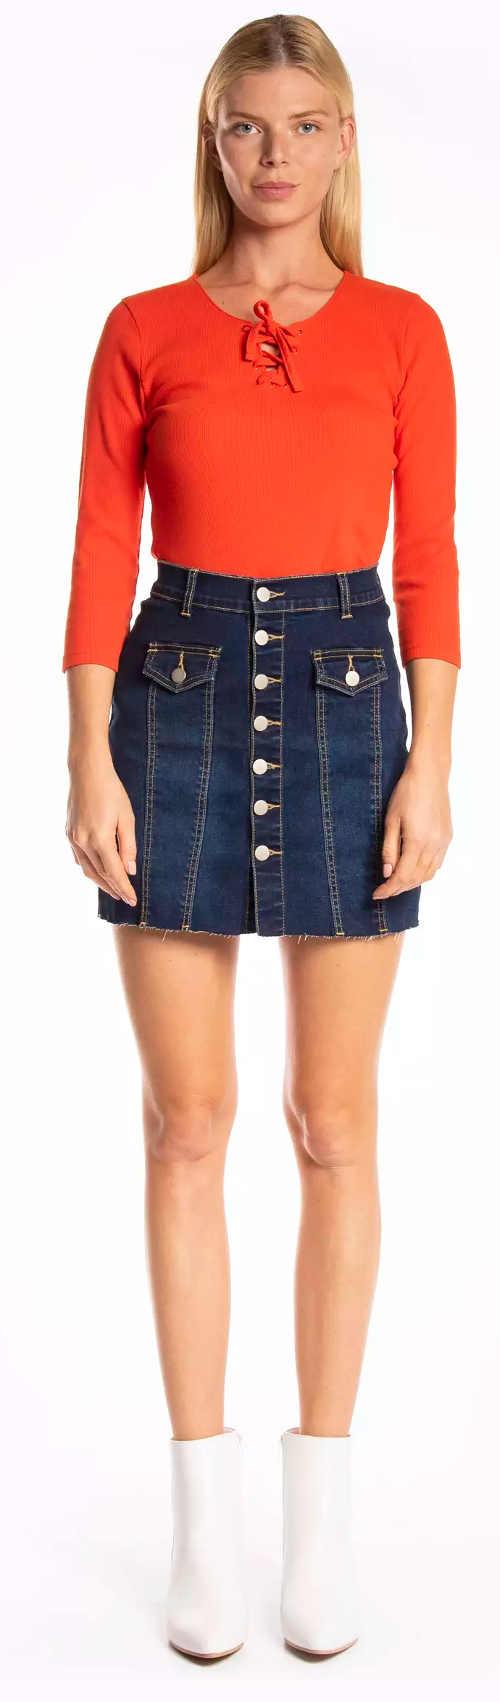 Krátka džínsová sukňa s gombíkmi vpredu po celej dĺžke